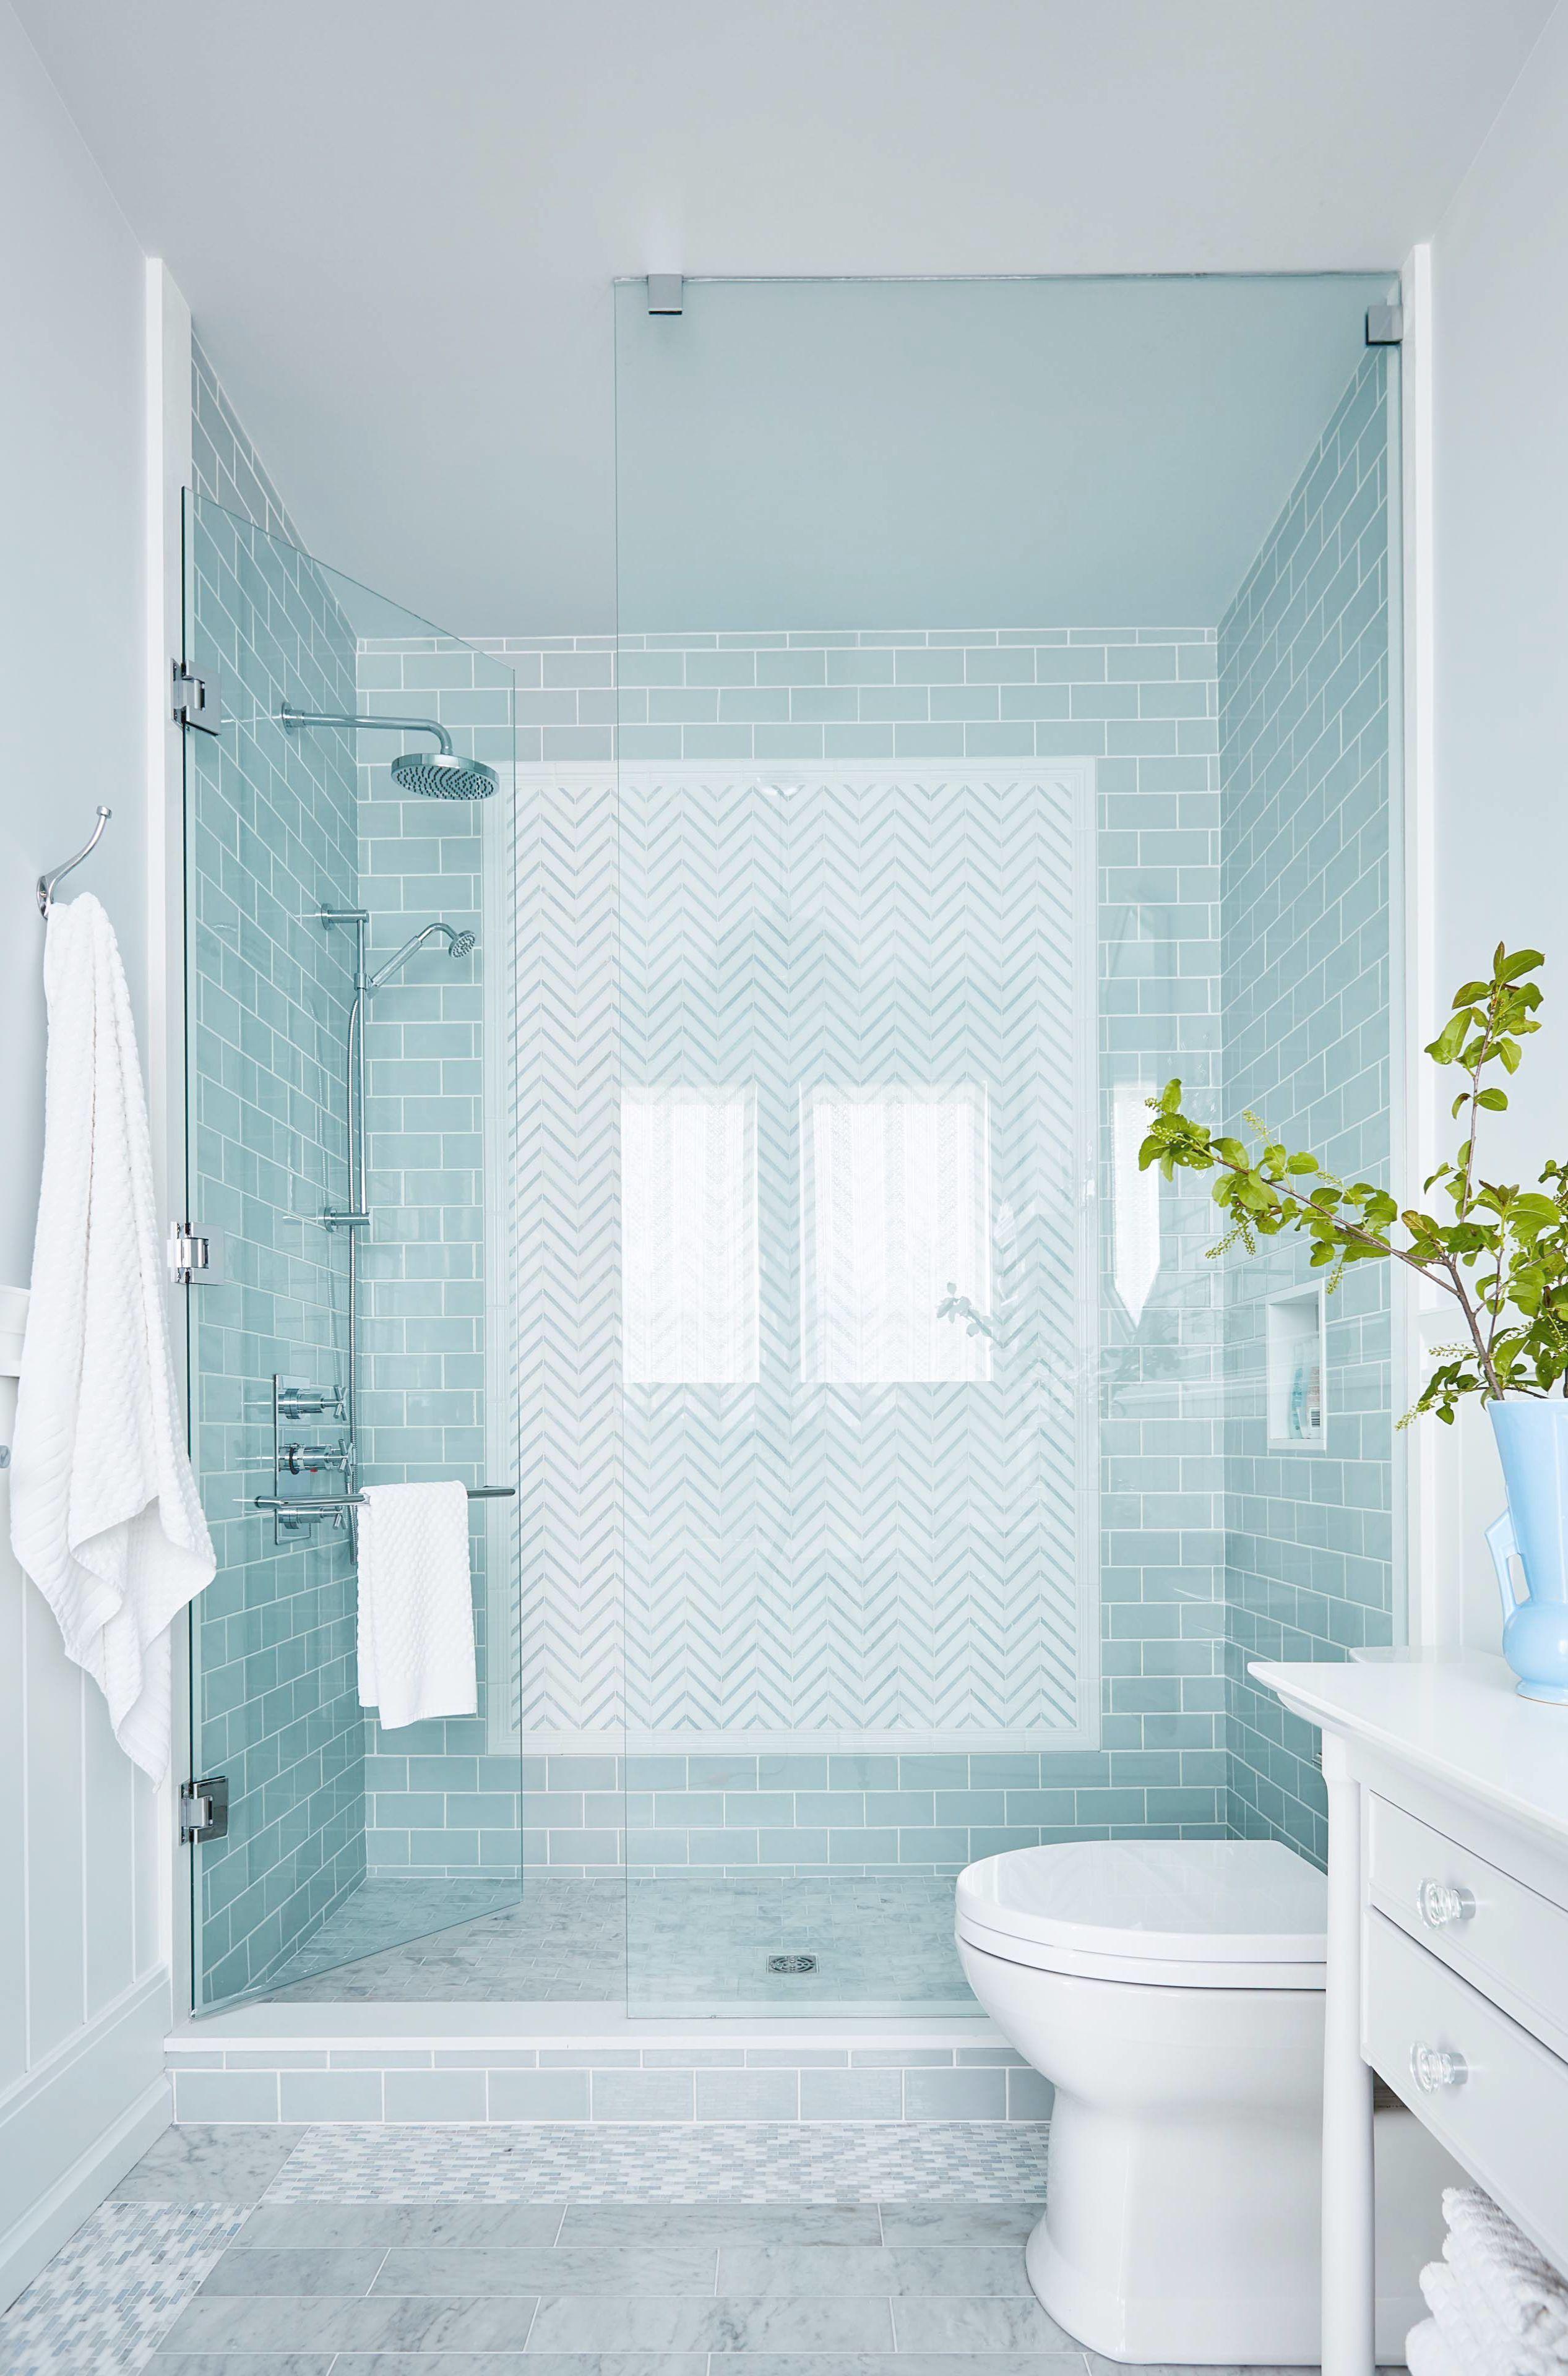 Bathroom Tile Ideas Green On Bathroom Light Fixtures Beach Theme Bathroom Beach Fixture In 2020 Bathroom Tile Designs Simple Bathroom Designs Bathroom Remodel Master